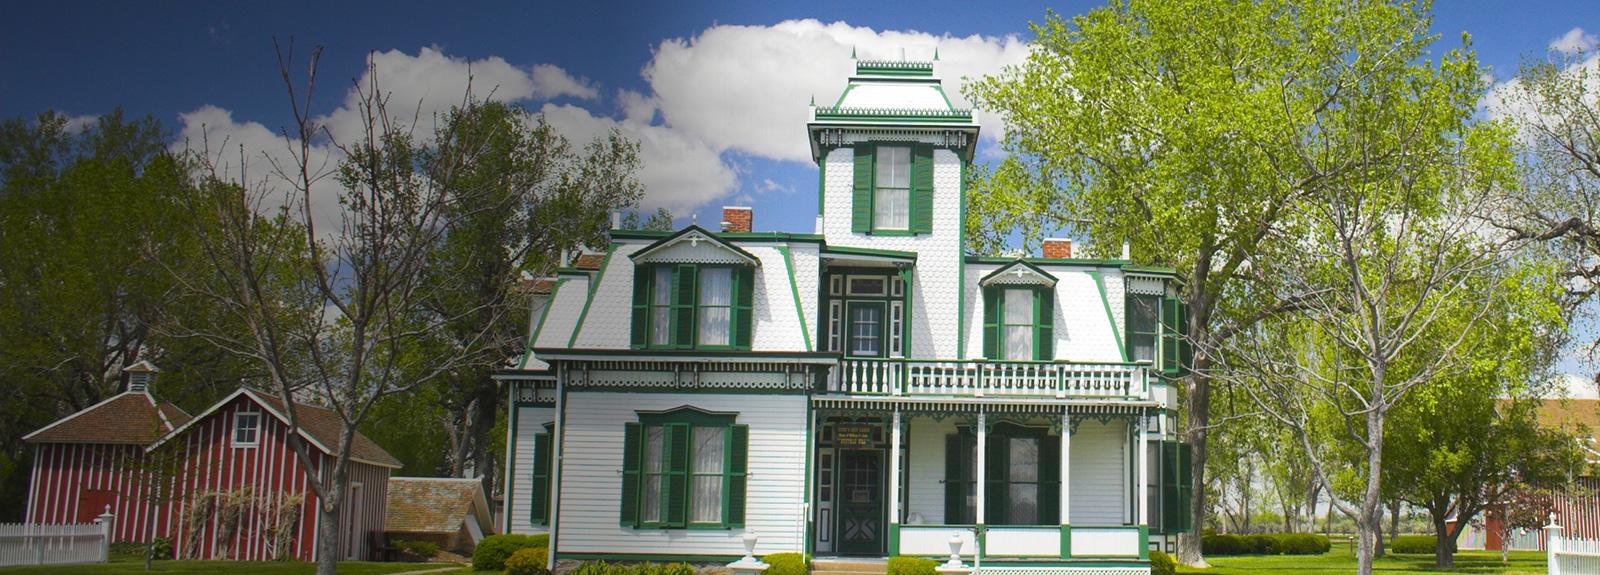 Nebraska Omaha home warranty companies reviews